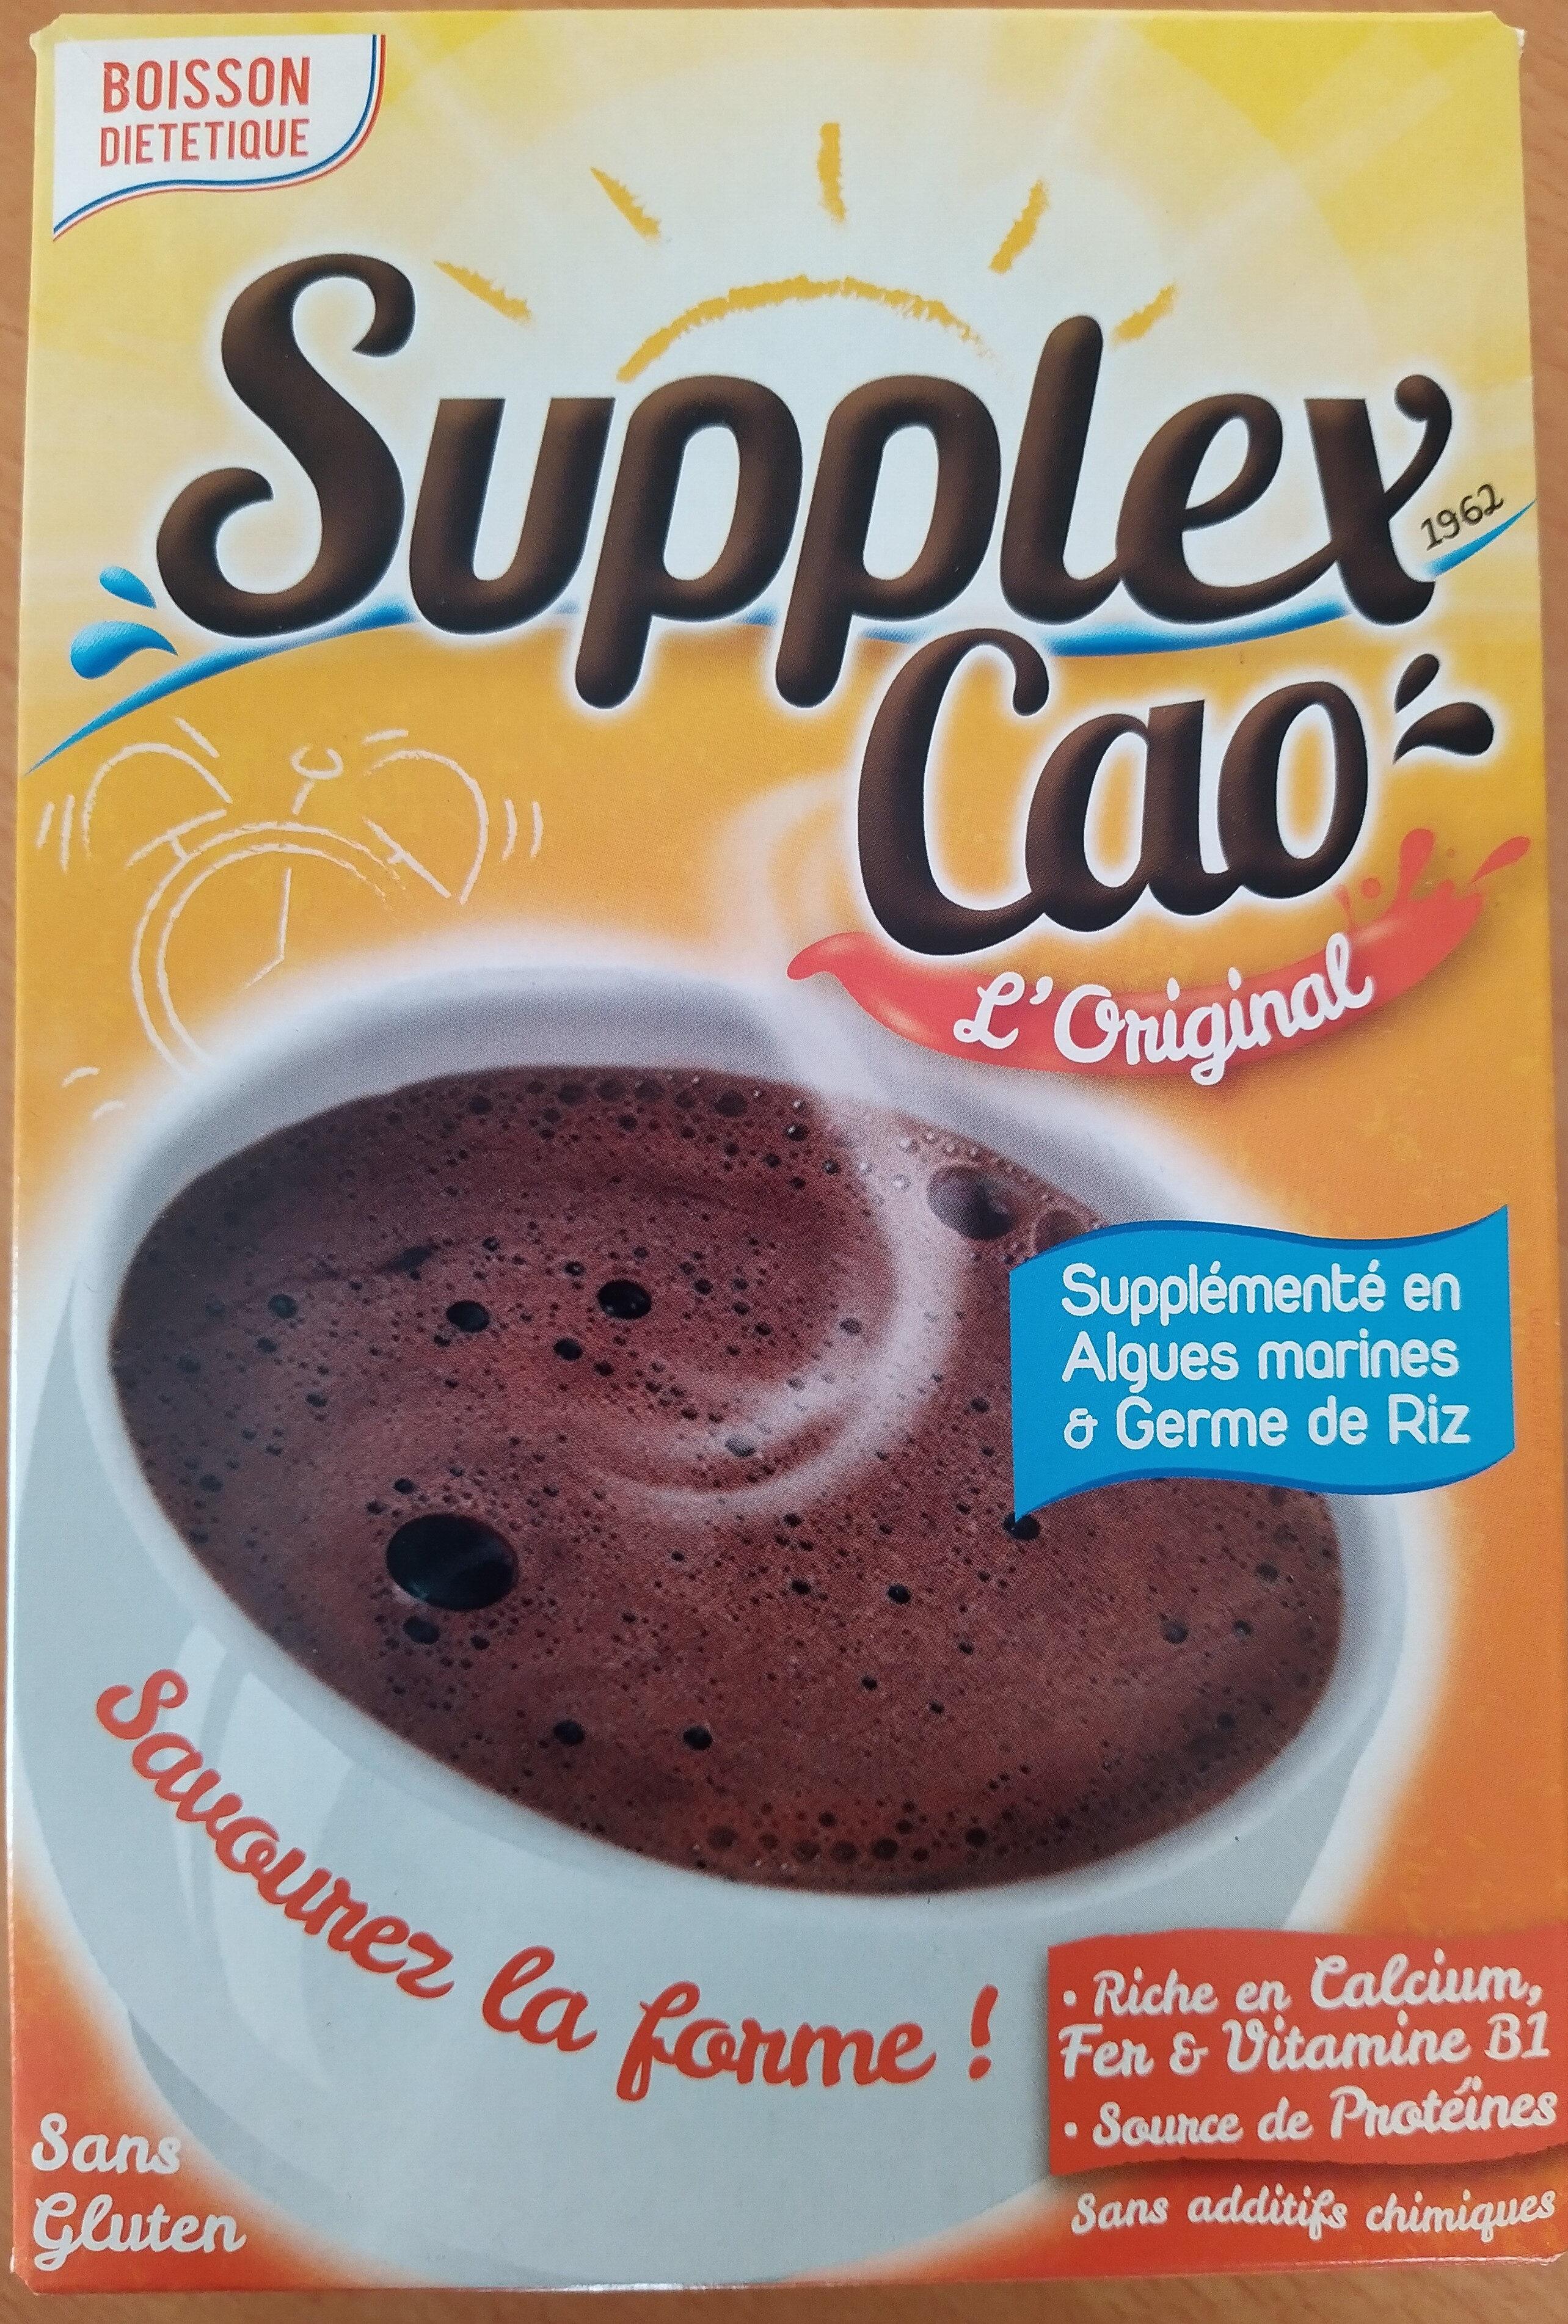 Cao au cacao maigre - Product - fr